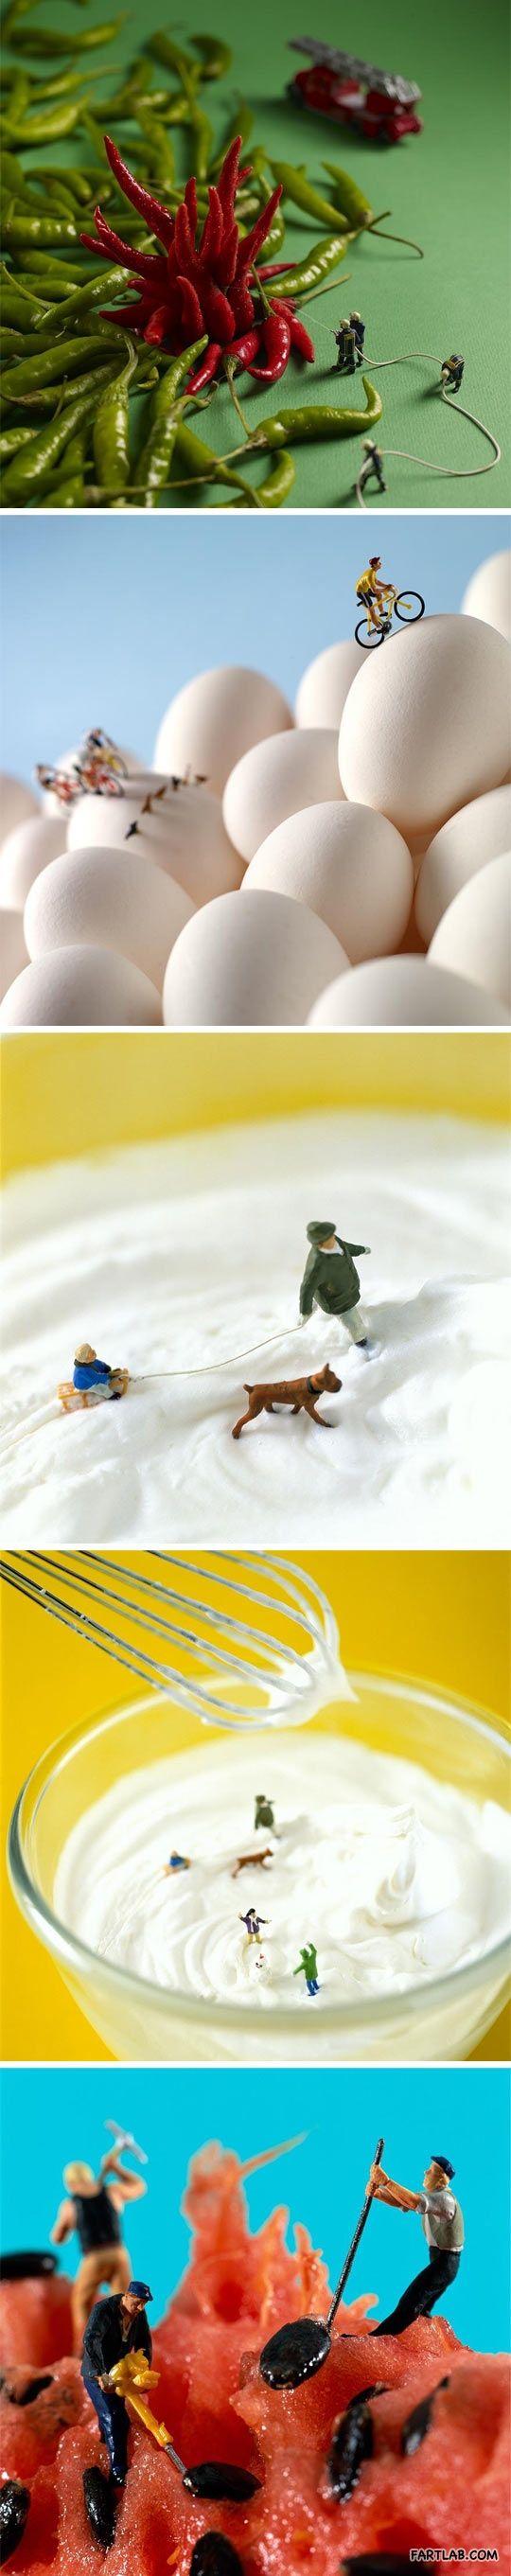 Miniature world of Miniam…